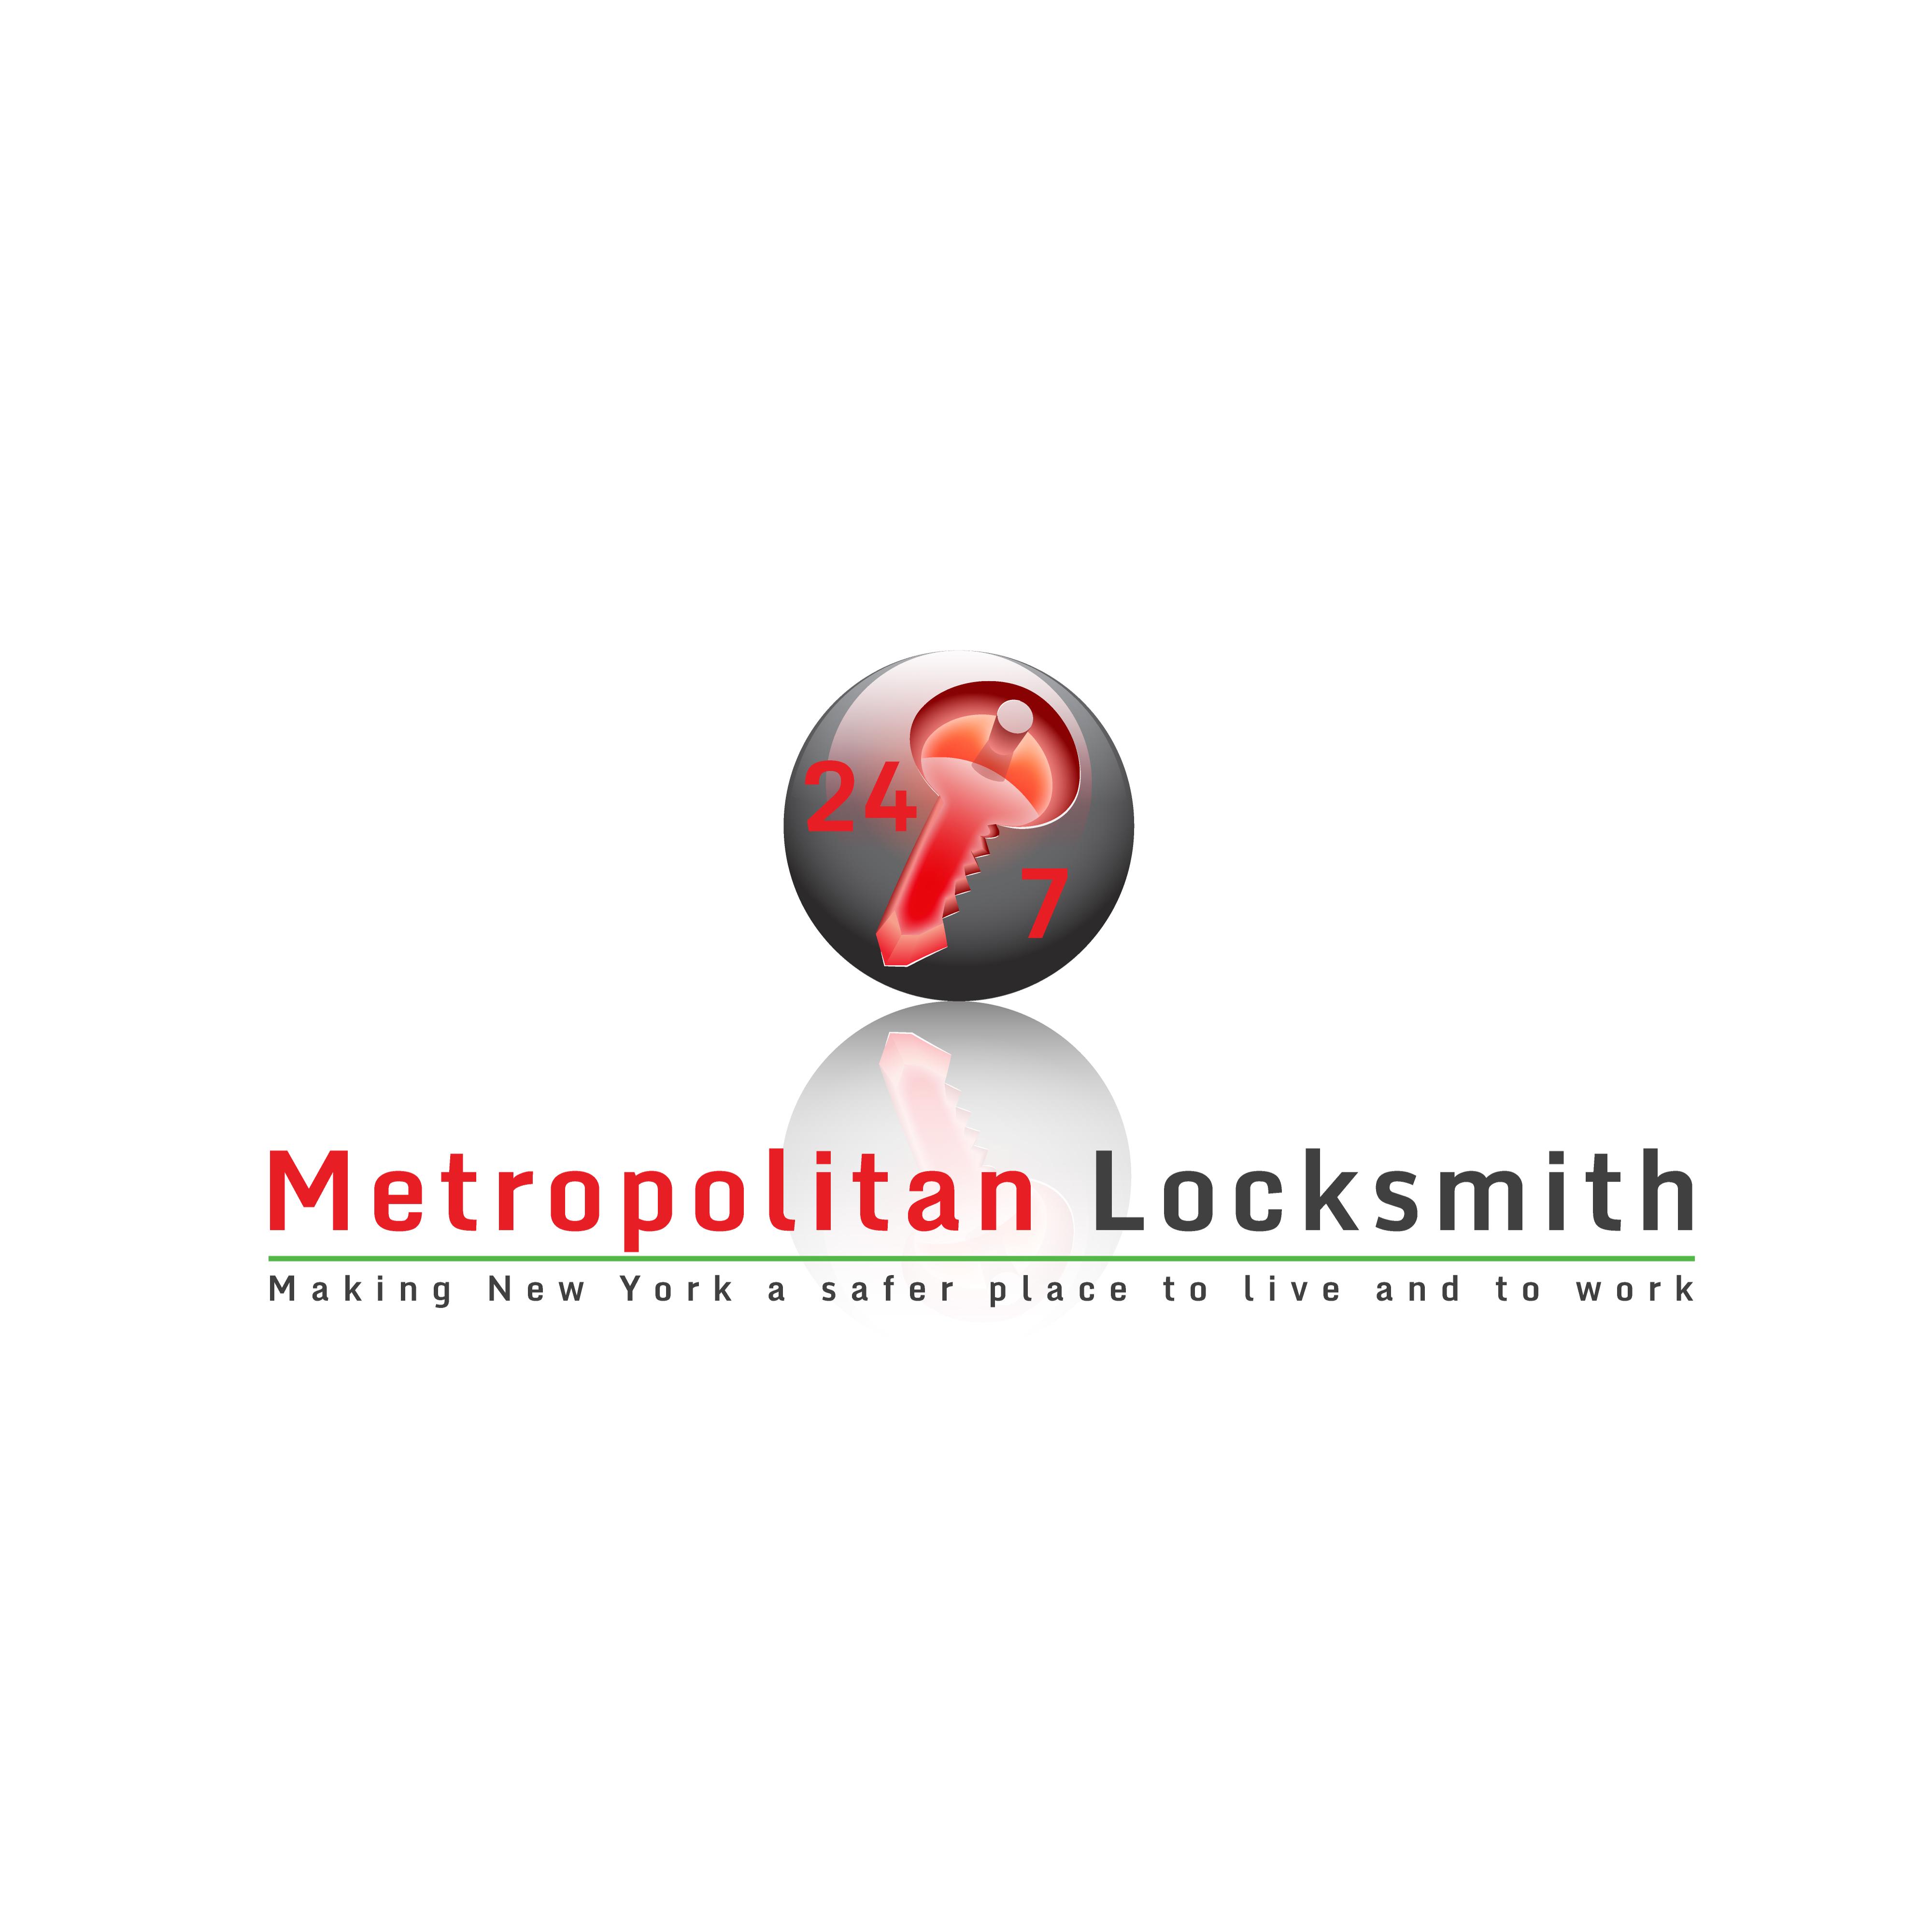 Metropolitan Locksmith